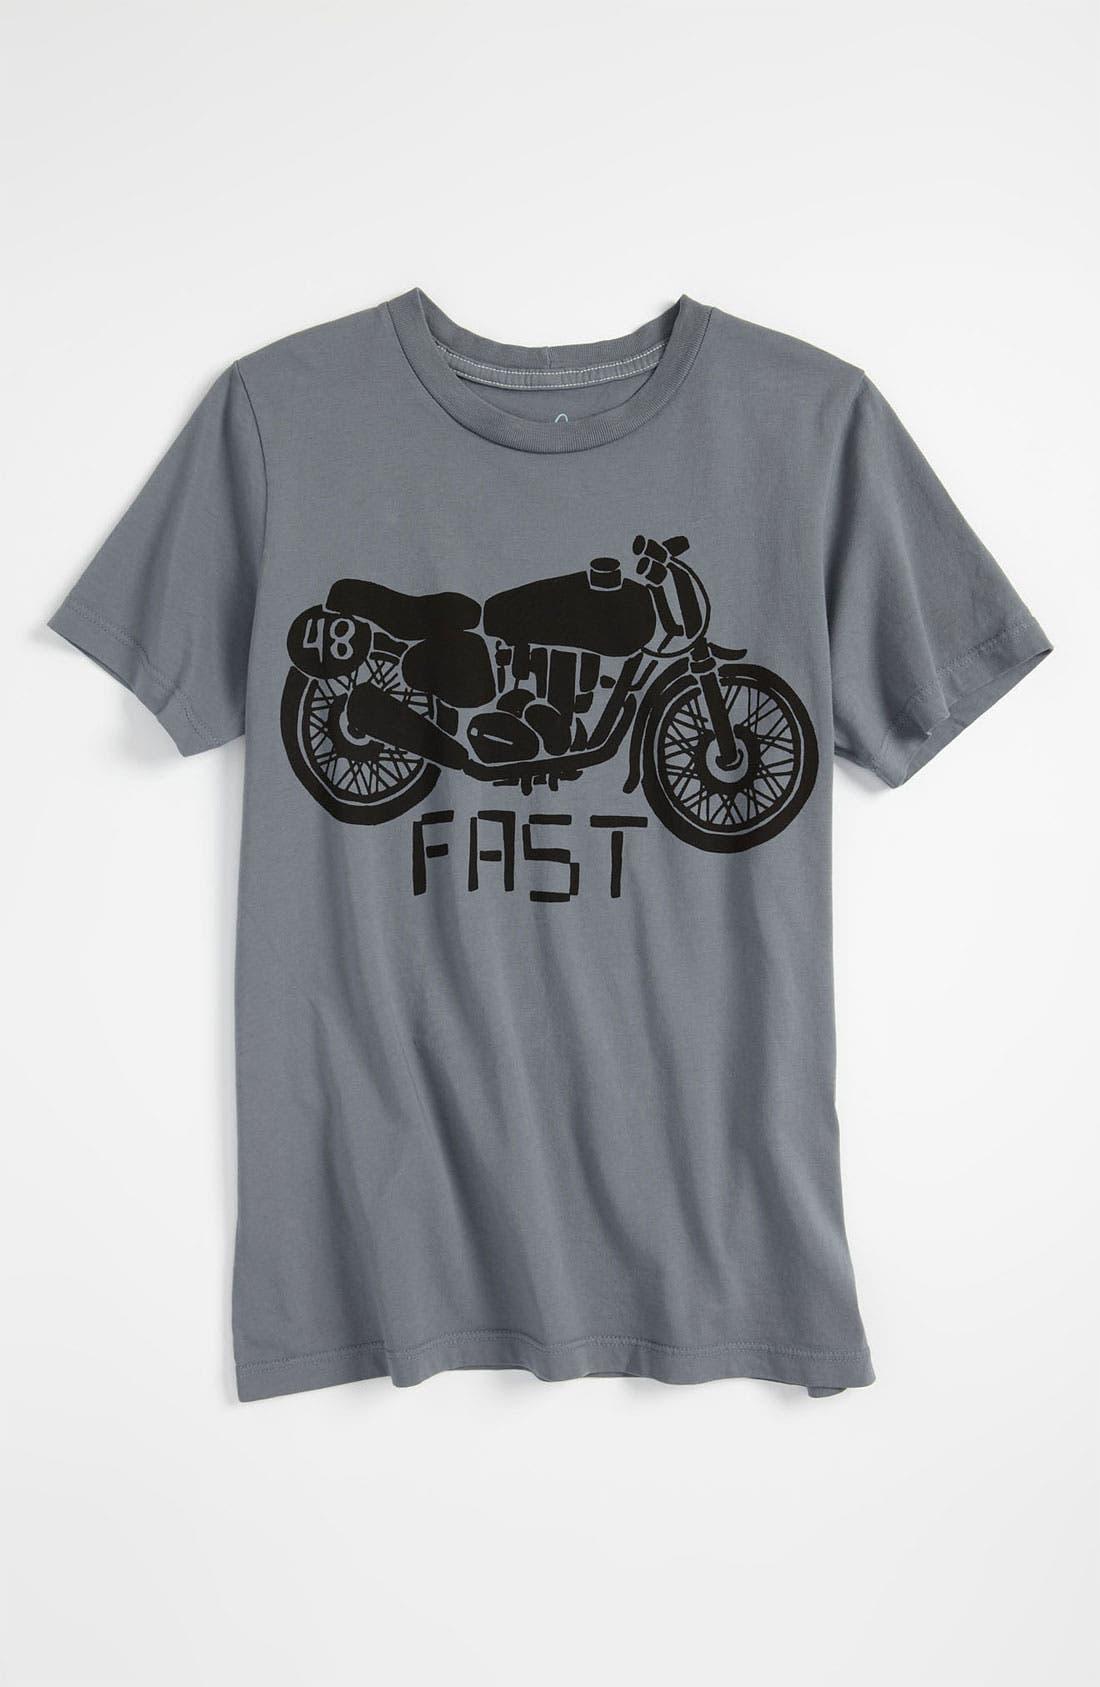 Alternate Image 1 Selected - Peek 'Motorcycle' T-Shirt (Toddler, Little Boys & Big Boys)